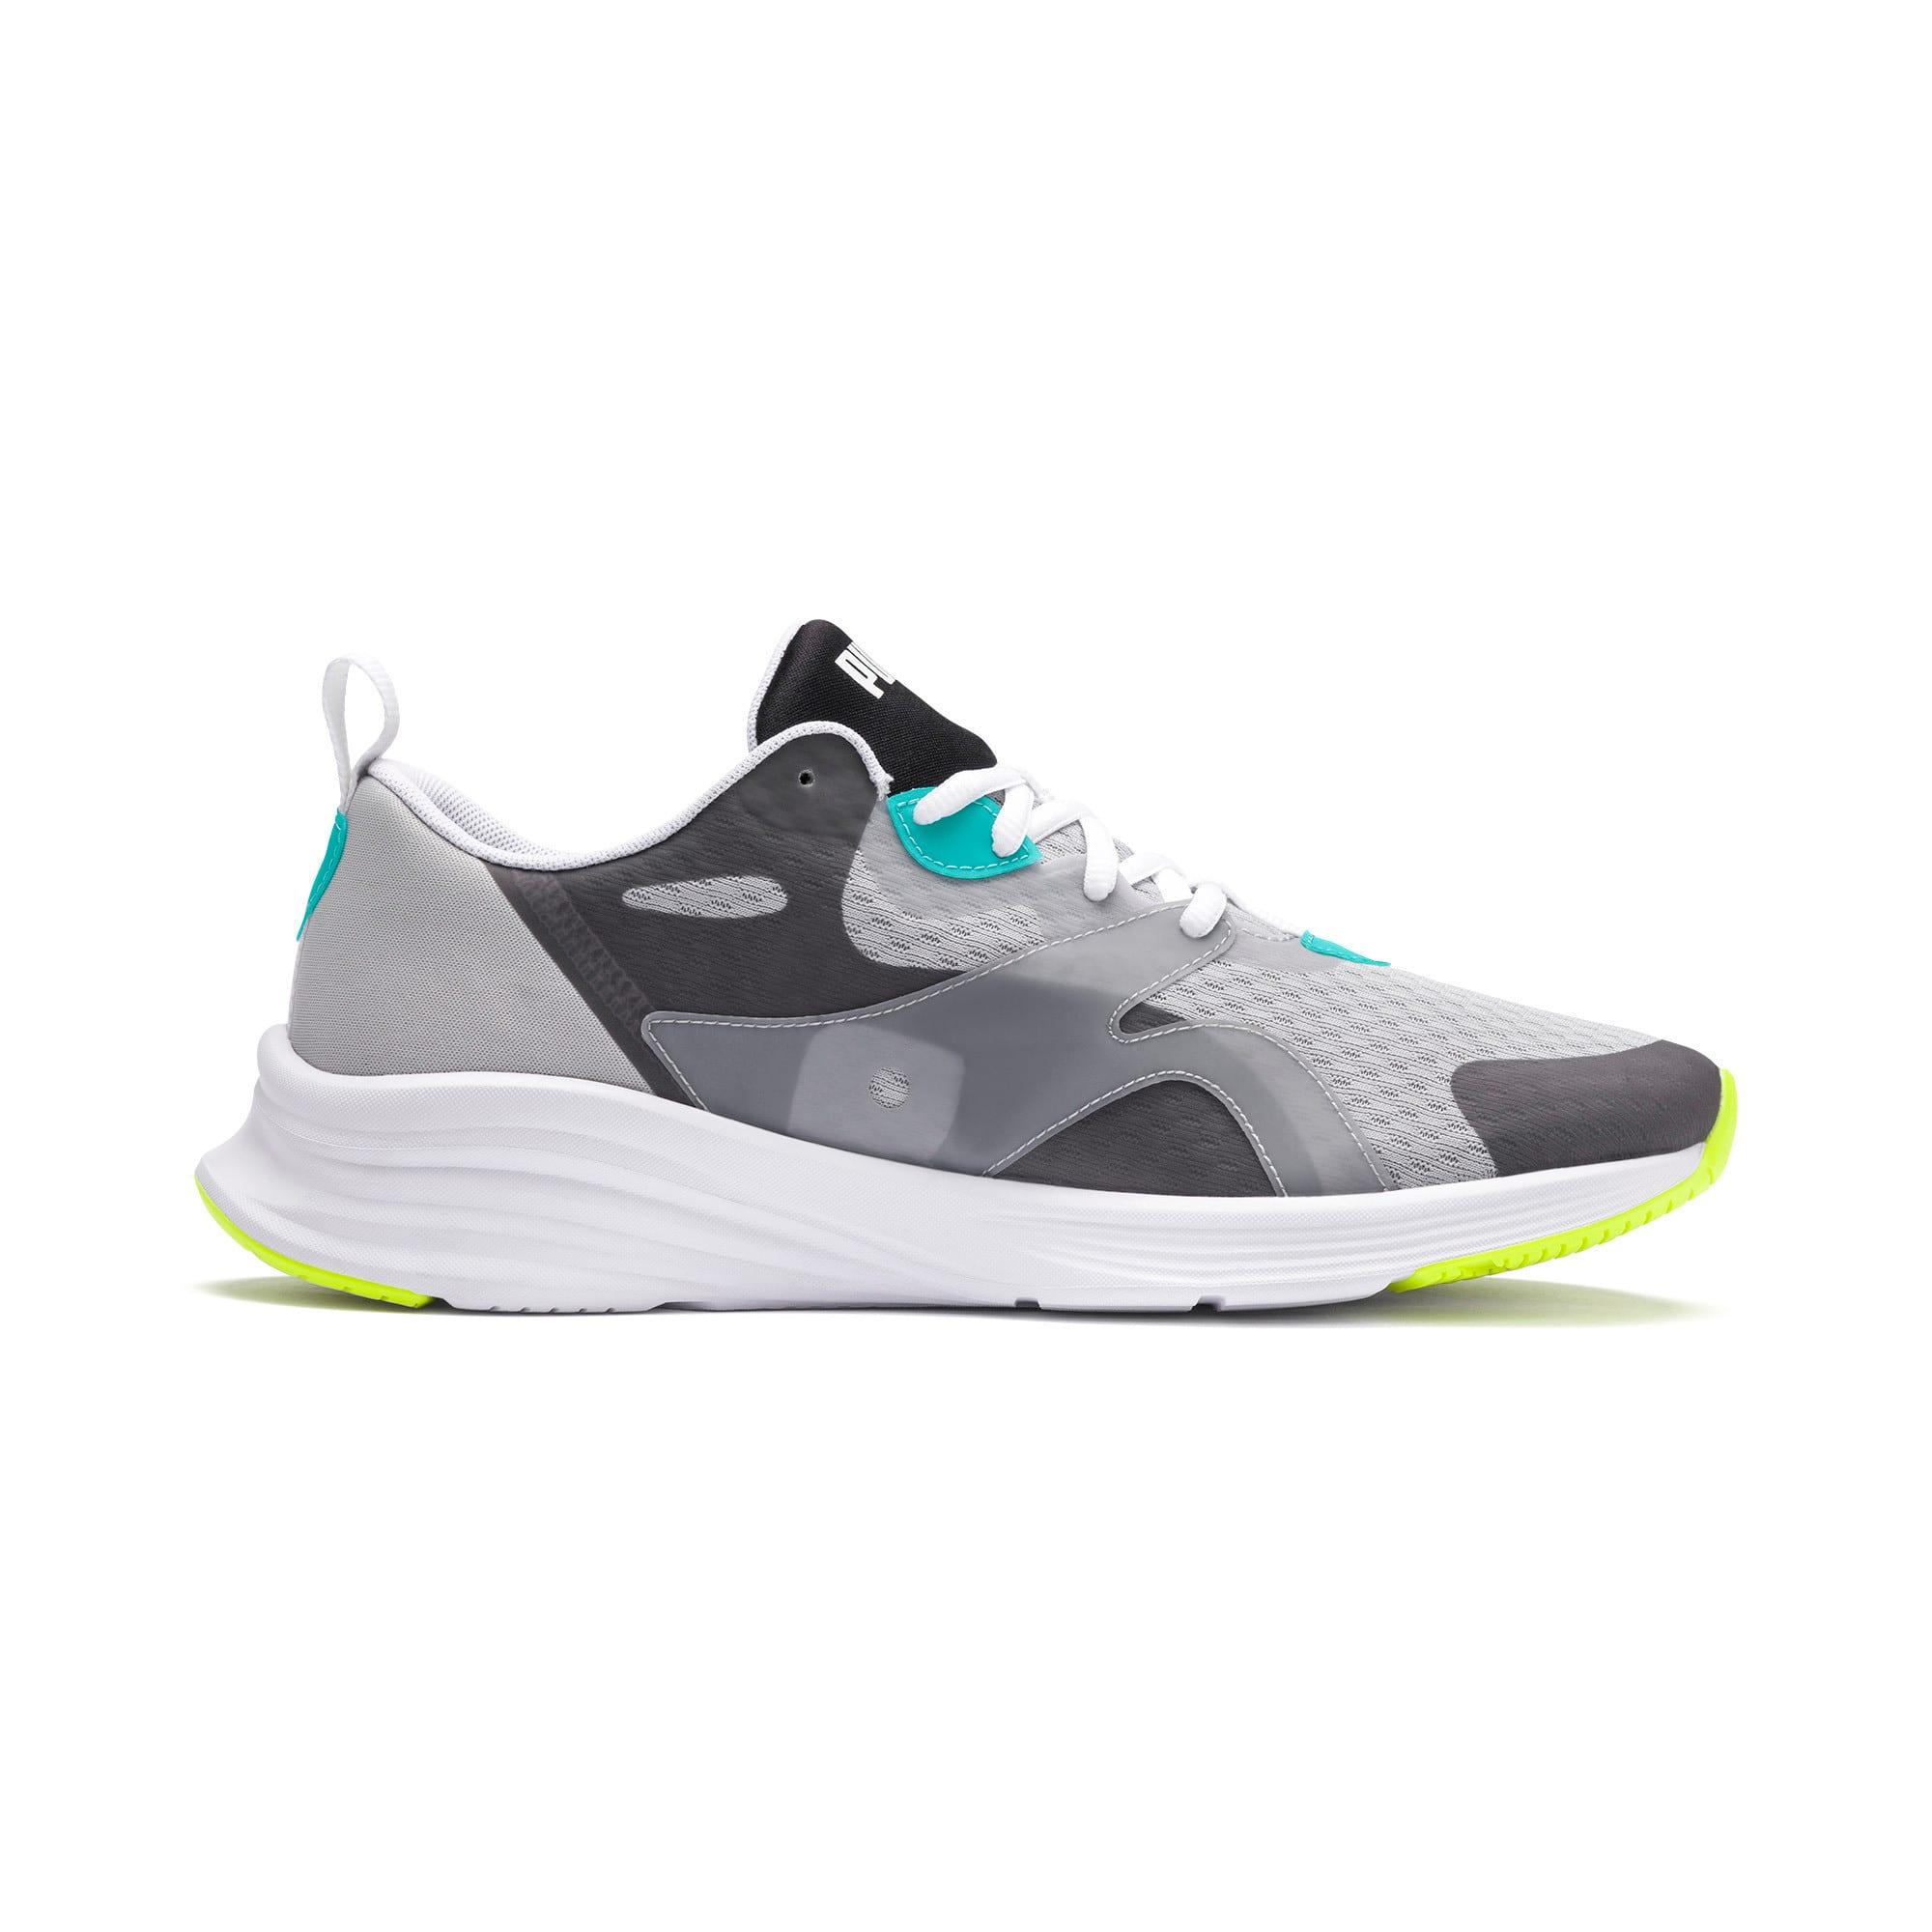 Thumbnail 5 of HYBRID Fuego Men's Running Shoes, High Rise-Blue Turquoise, medium